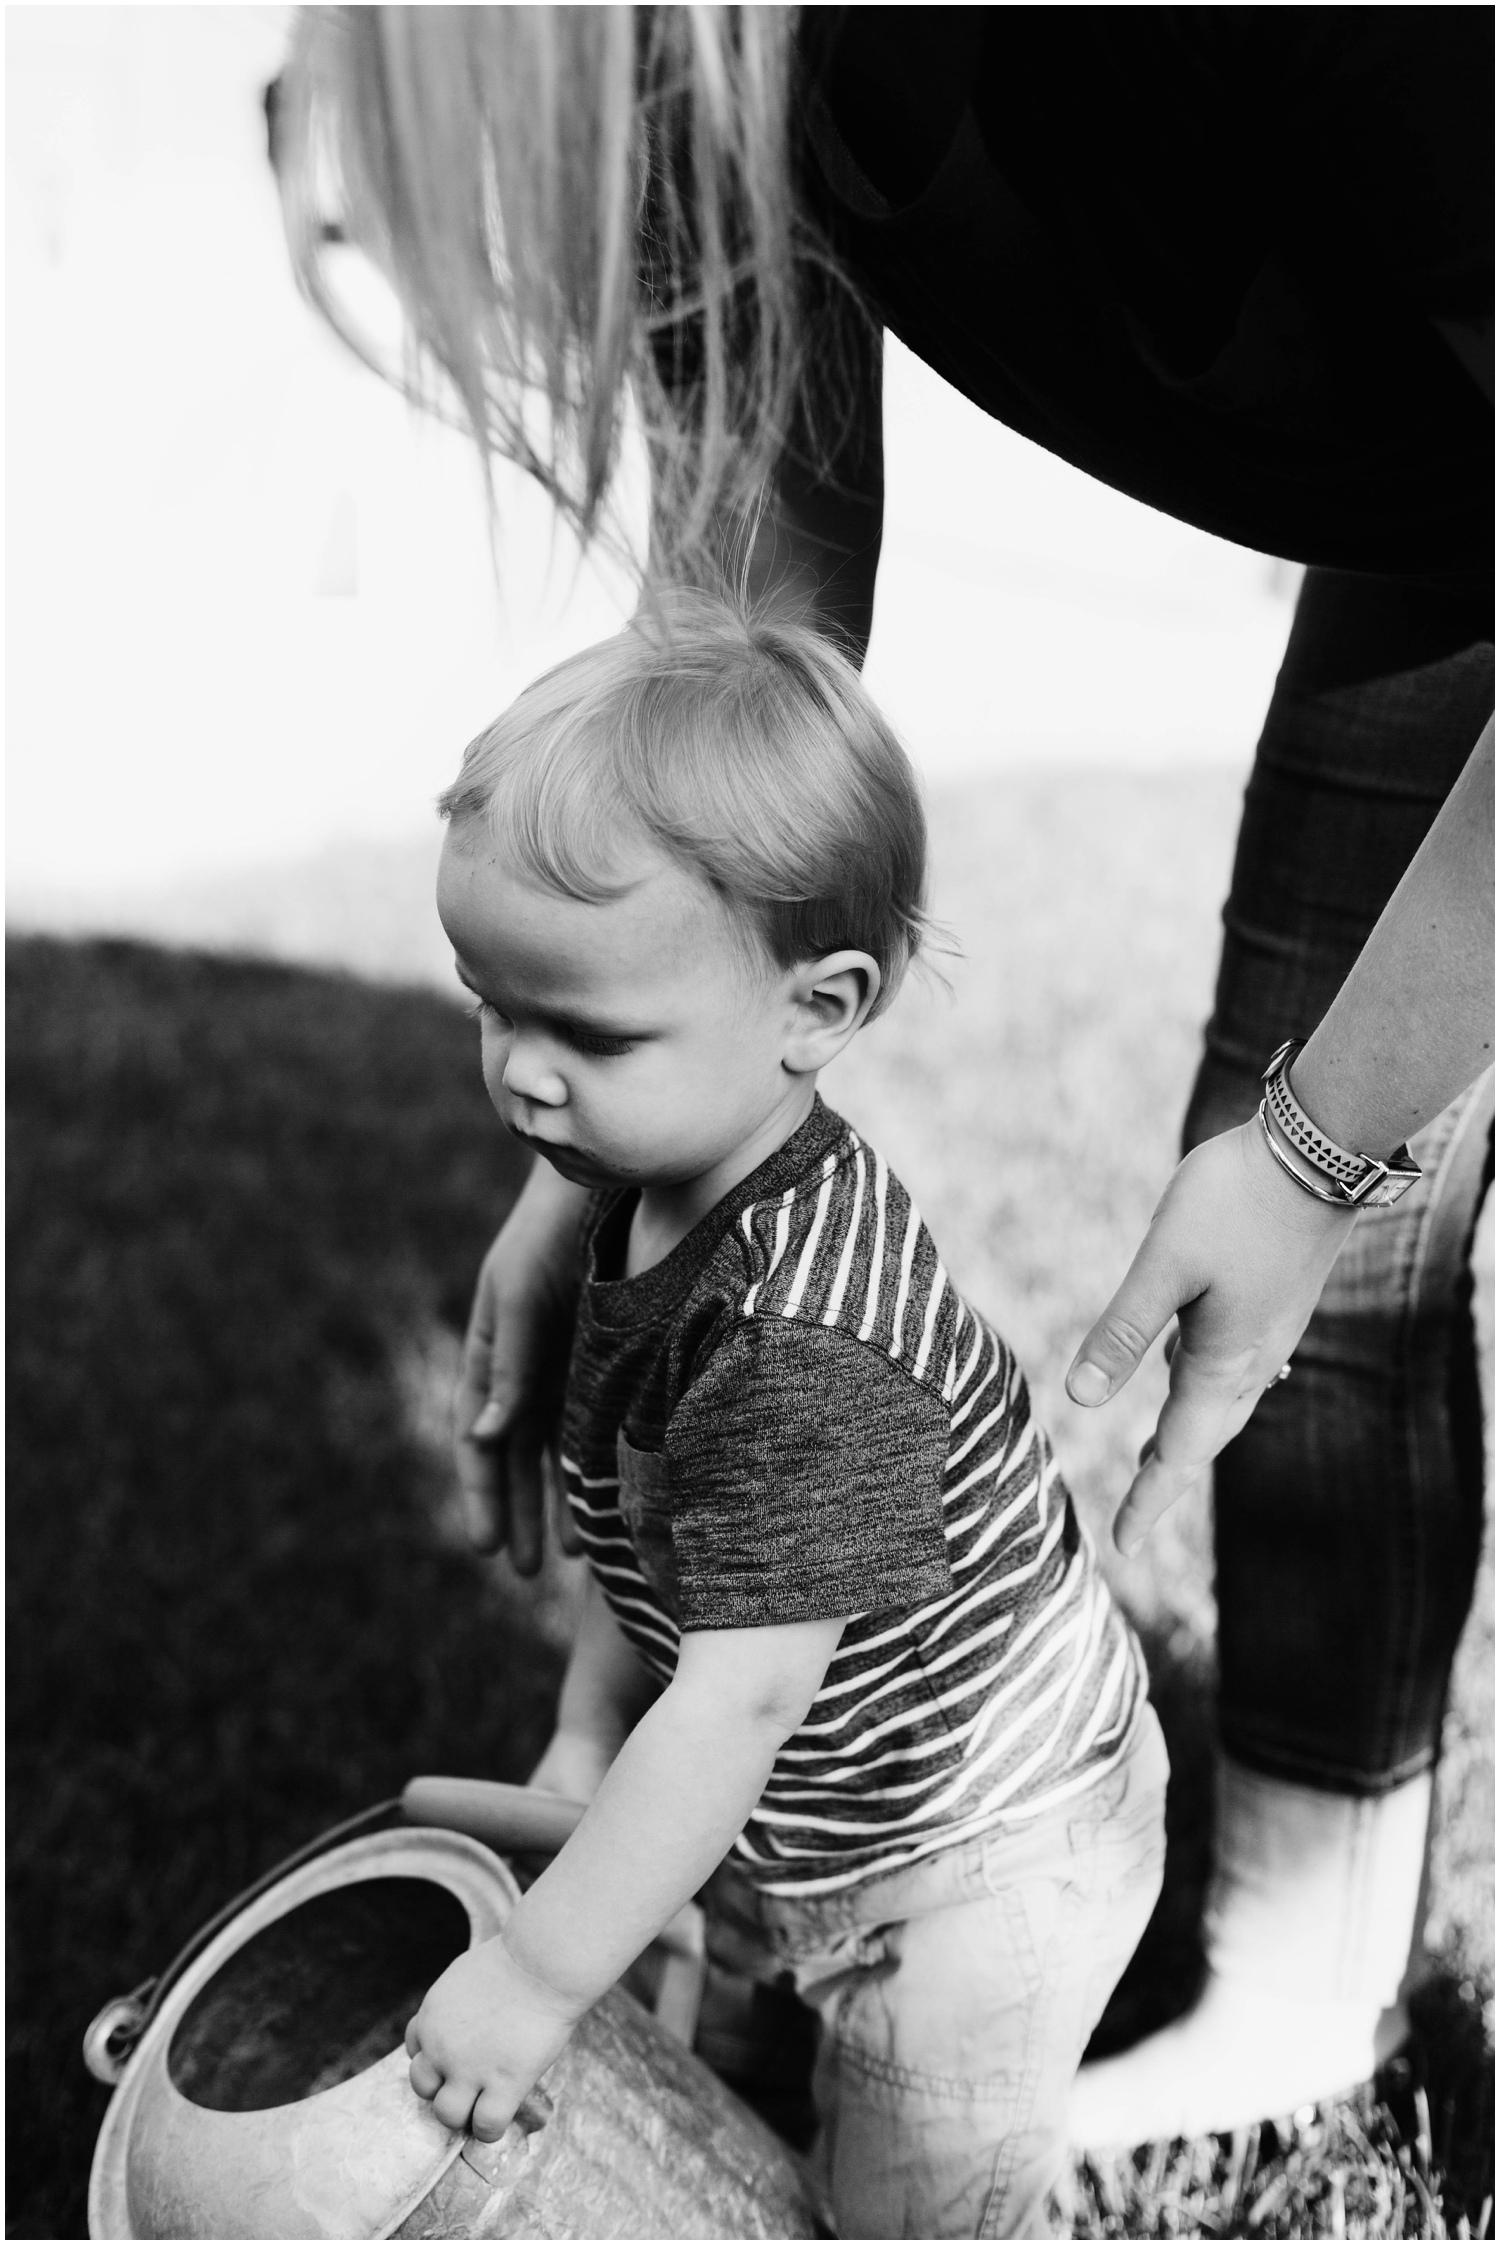 colorado_family_photo_session_unposed_childhood_denver_adventure_taylor_powers__0028.jpg